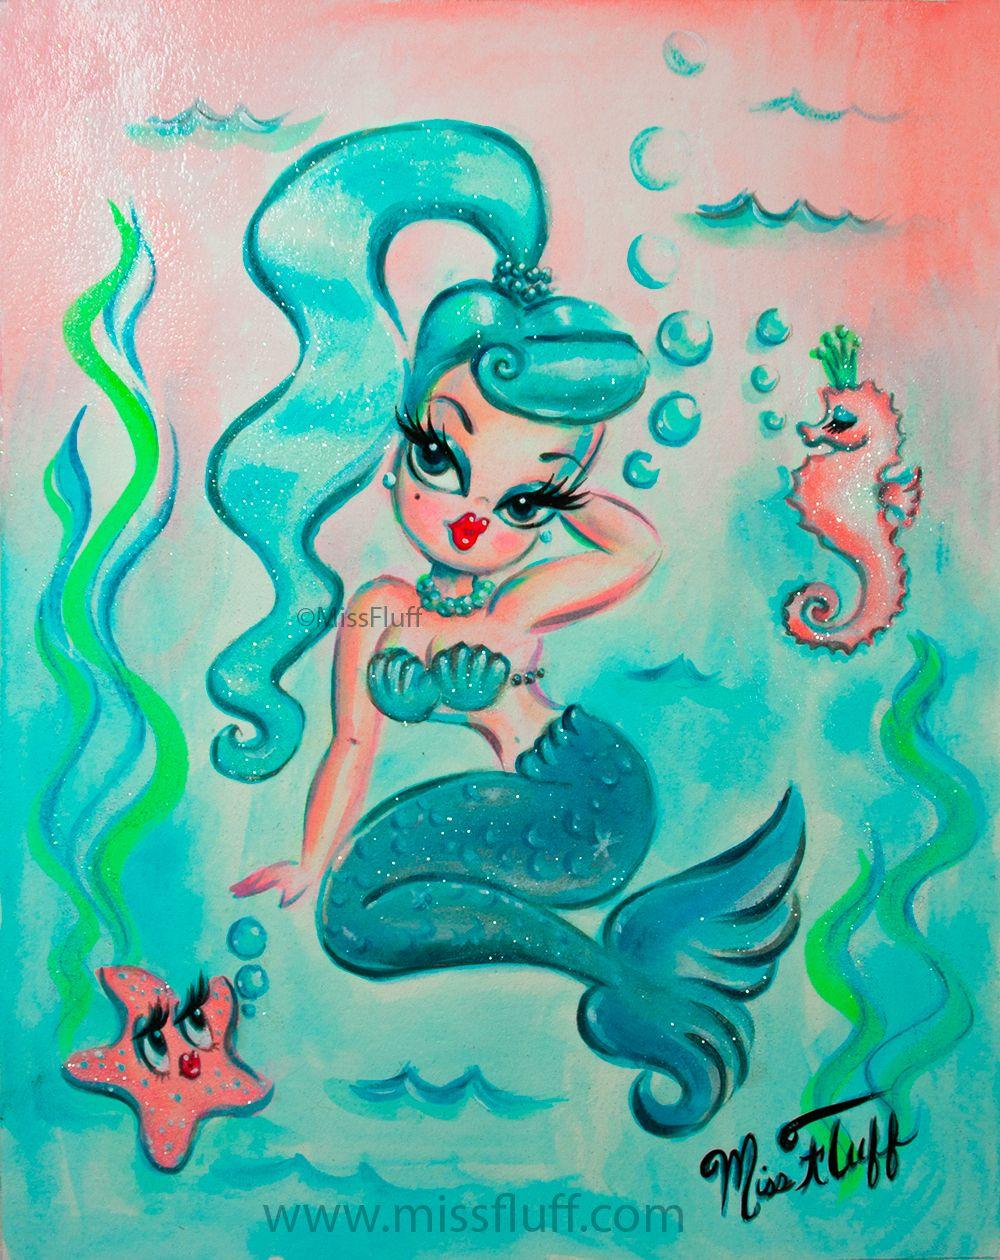 Candy blue ponytail babydoll mermaid original painting